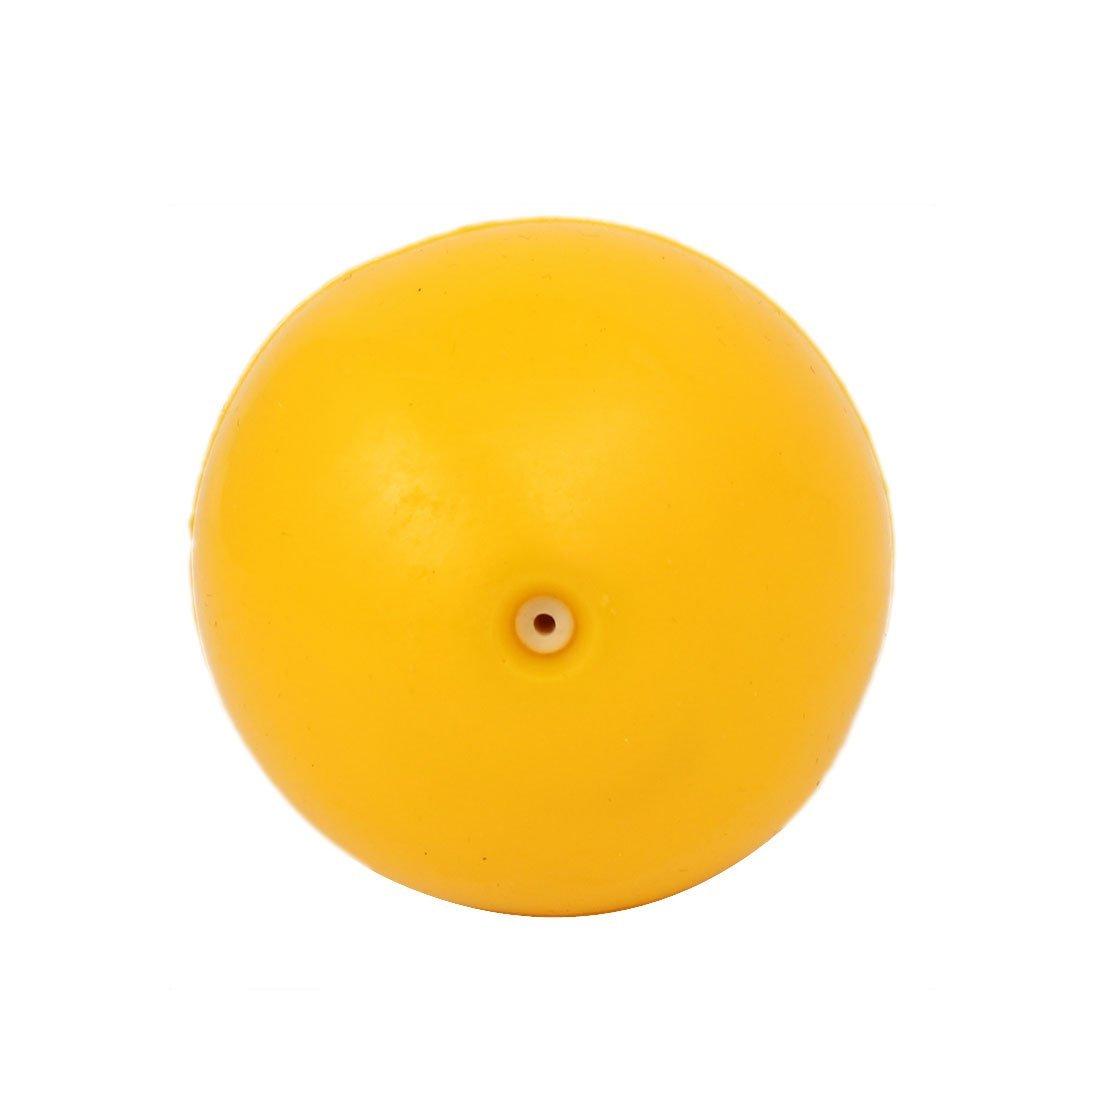 eDealMax Forma Dia Rubber Ball 54mm caja de reloj removedor de tornillo amarillo pegajoso abridor - - Amazon.com